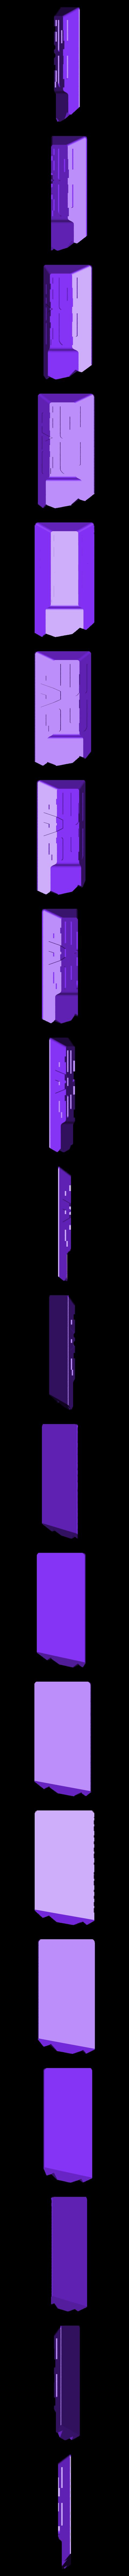 3DTAC_2.stl Download STL file 3DTAC / VERTX 80° Tactical Grip • 3D printing template, 3DMX